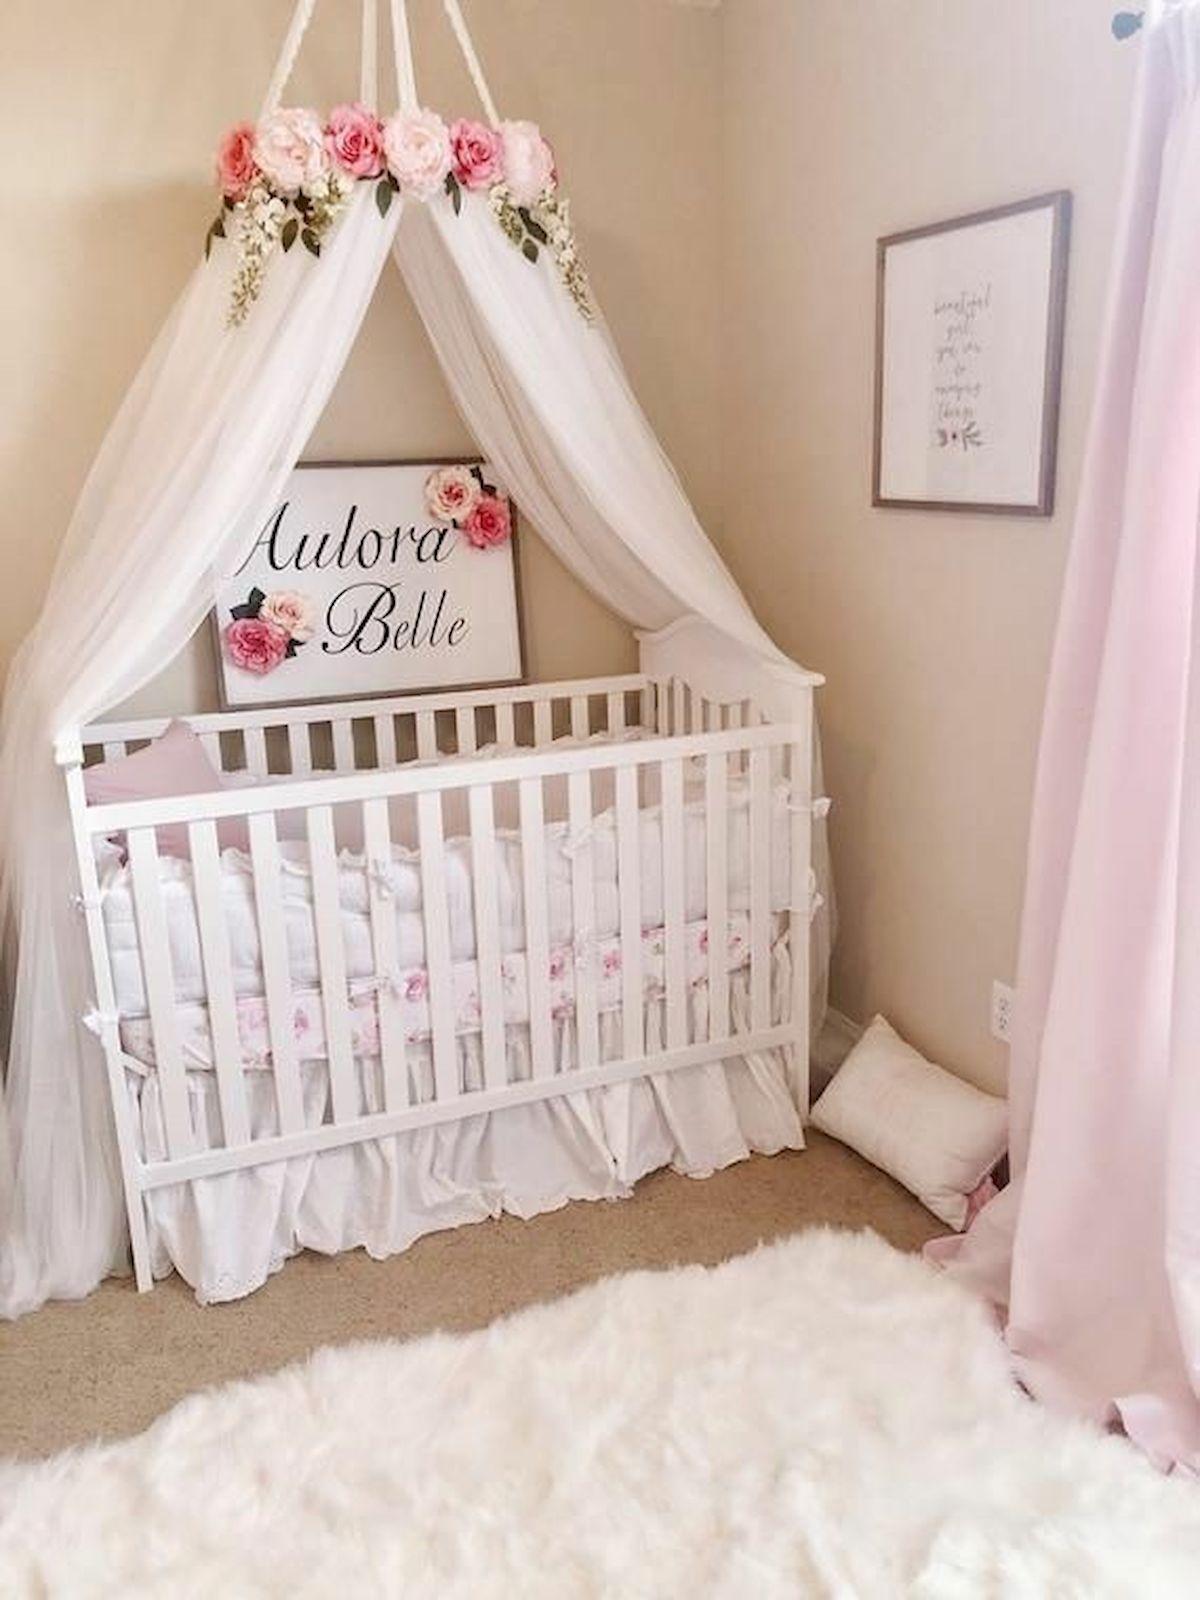 50 Cute Baby Nursery Ideas For Your Little Princes Baby Girl Nursery Room Girl Nursery Room Baby Girl Room